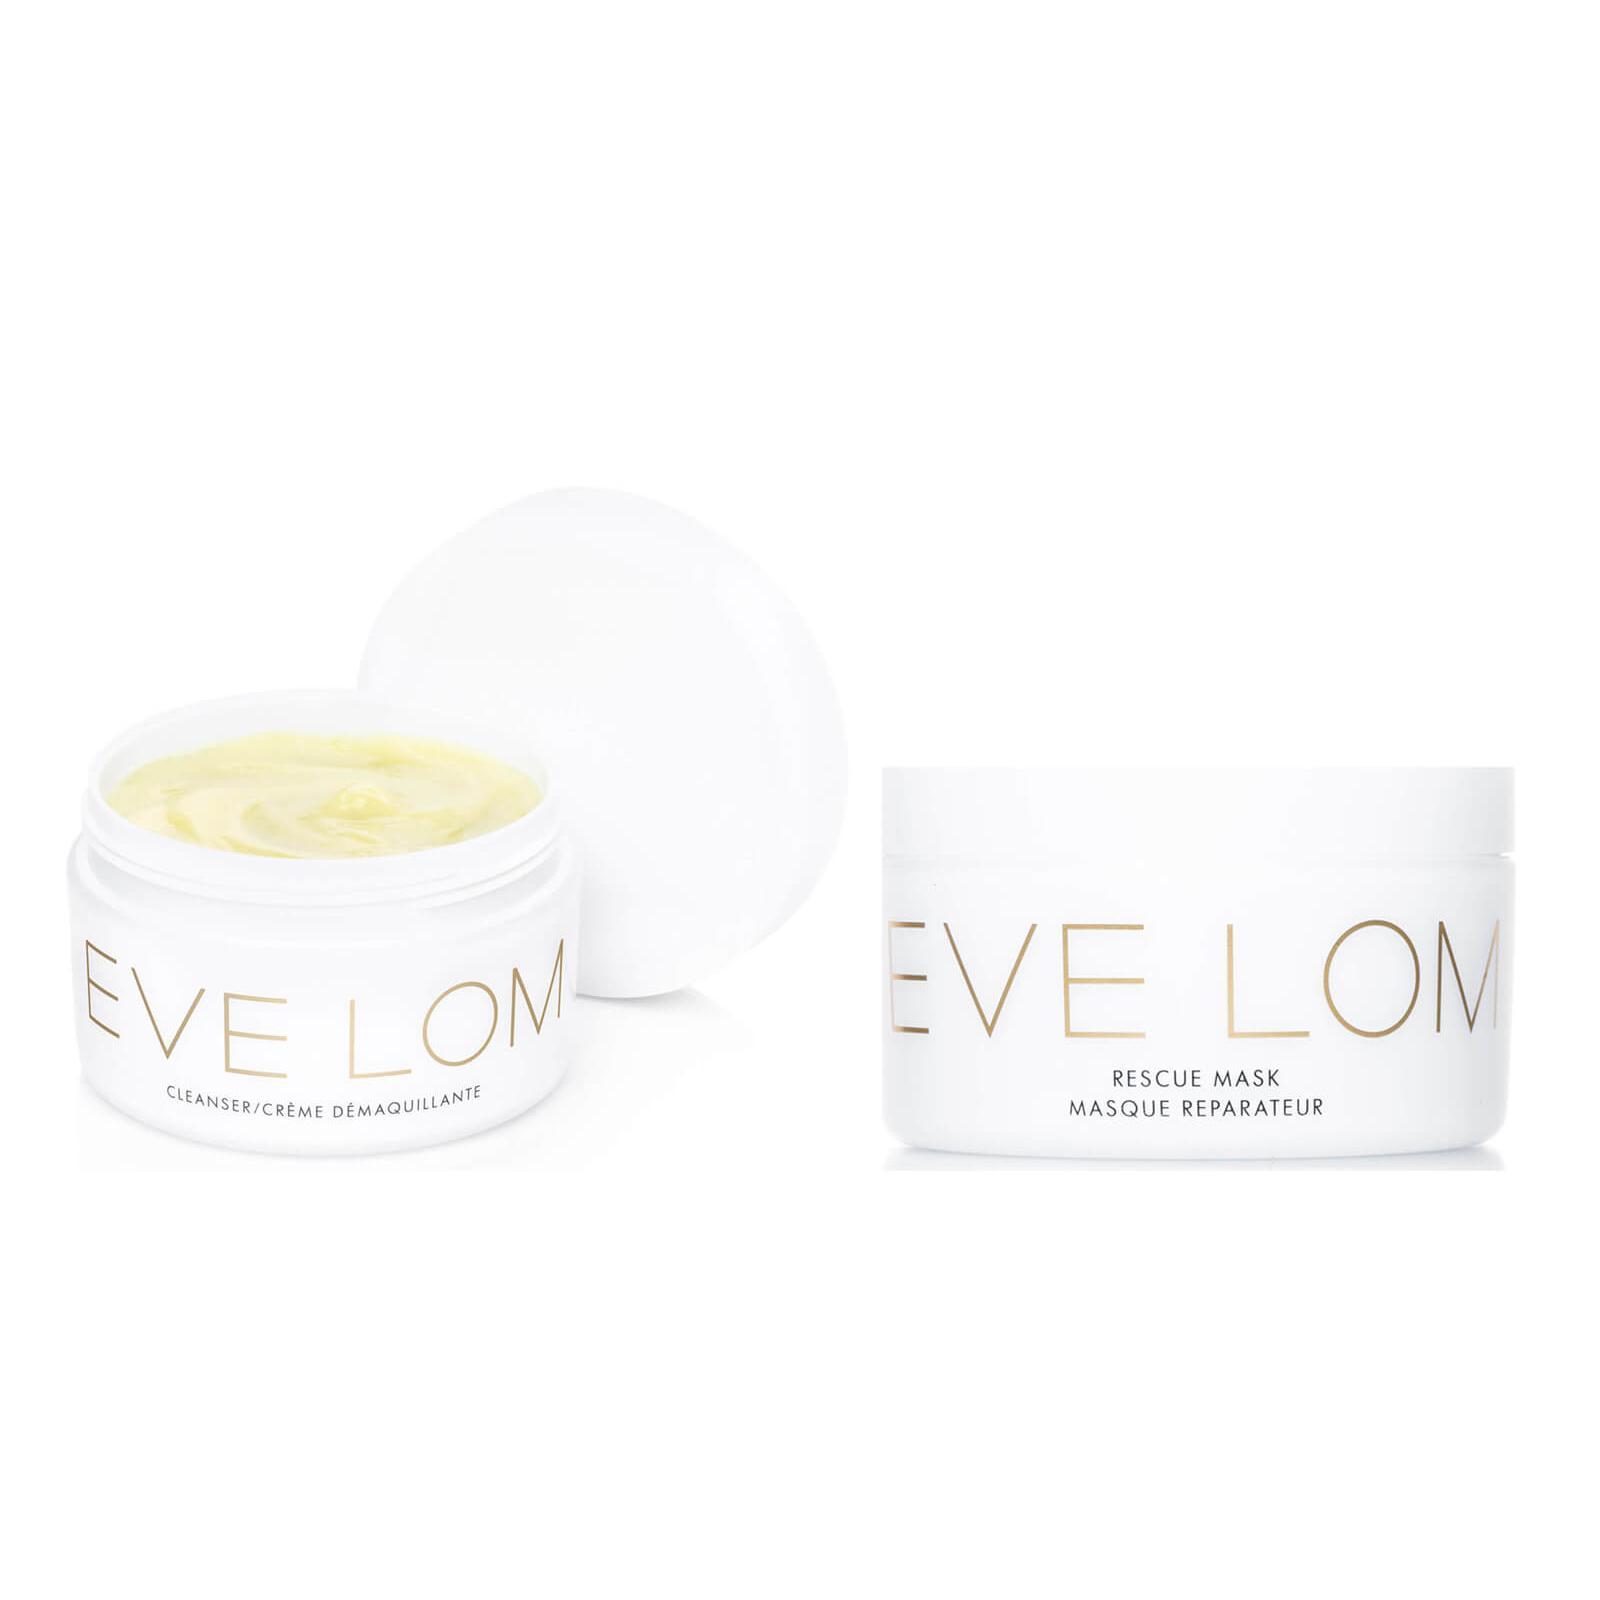 Eve Lom 明星清洁套装(100ml卸妆膏+100ml急救面膜)